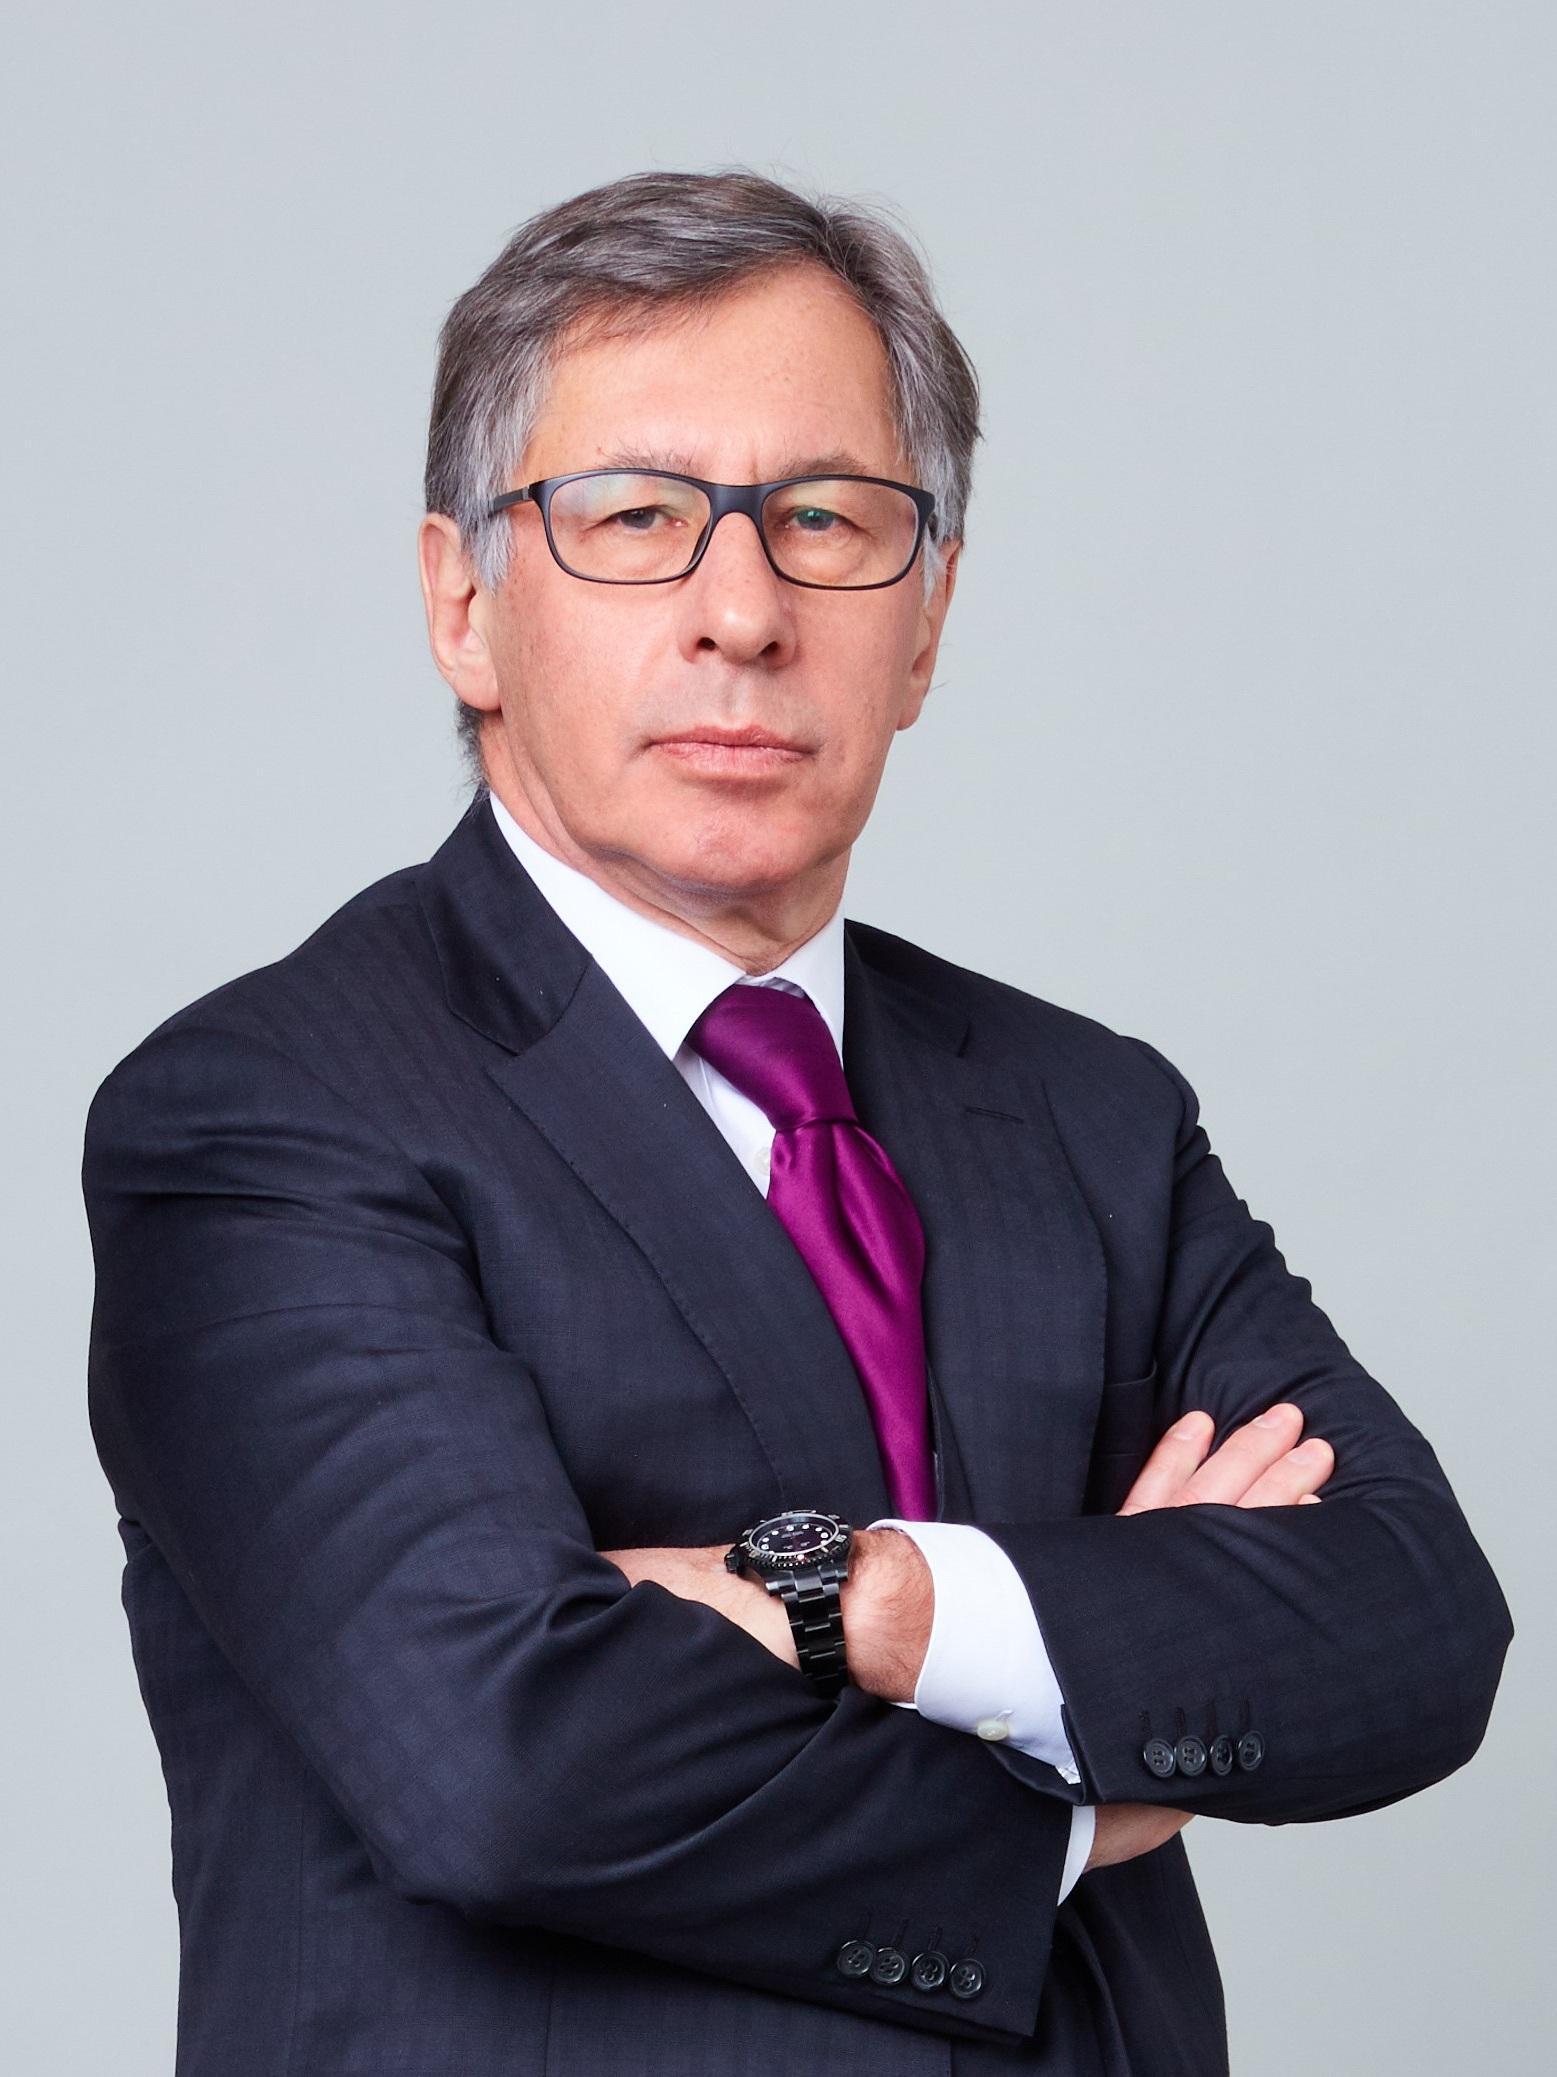 Petr Aven